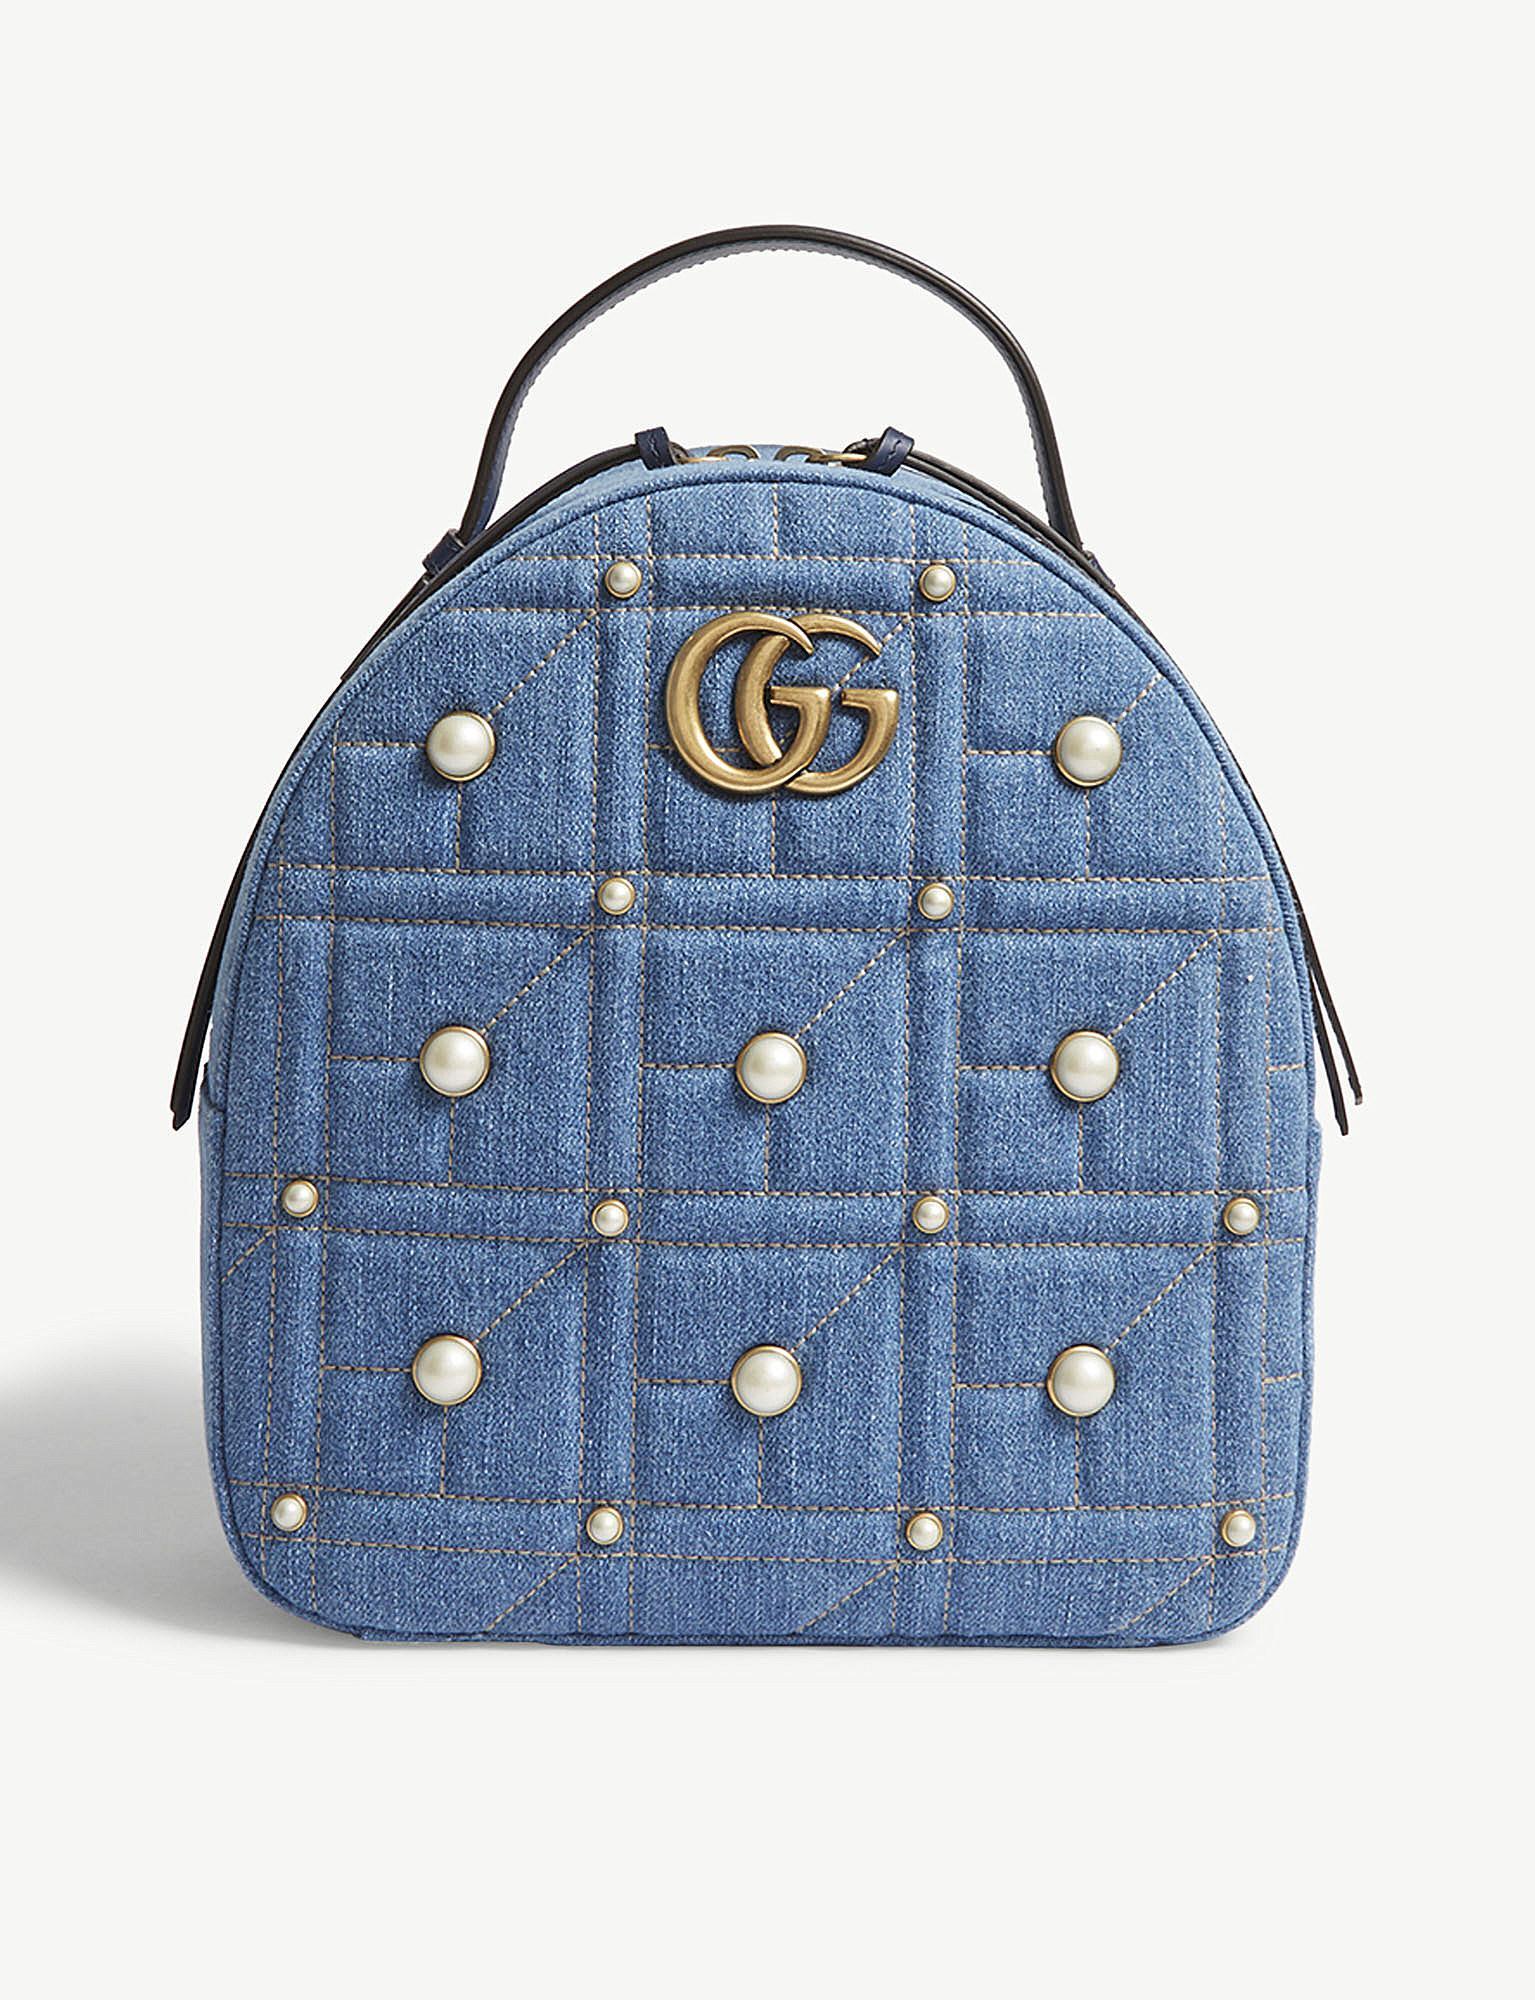 fc9cdd8317b Lyst - Gucci Gg Marmont Denim Backpack in Blue